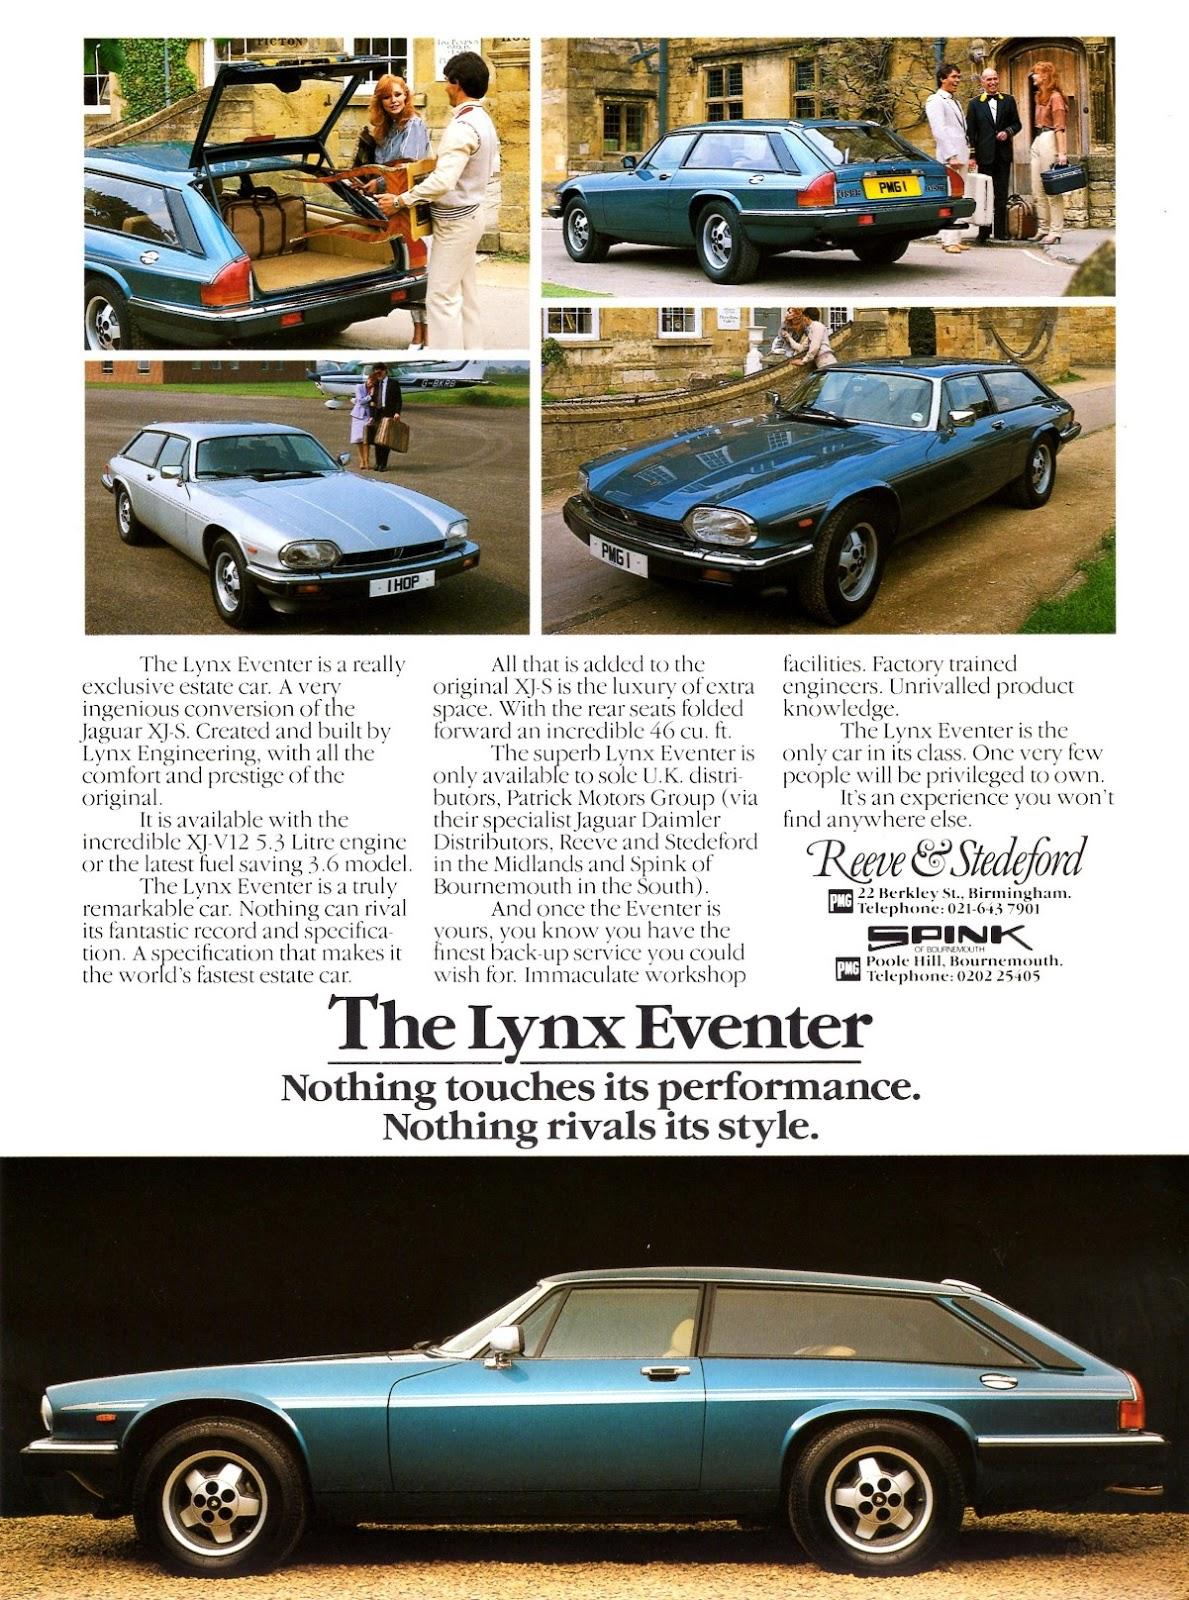 1983-Jaguar-XJ-S-Lynx-Eventer.jpg